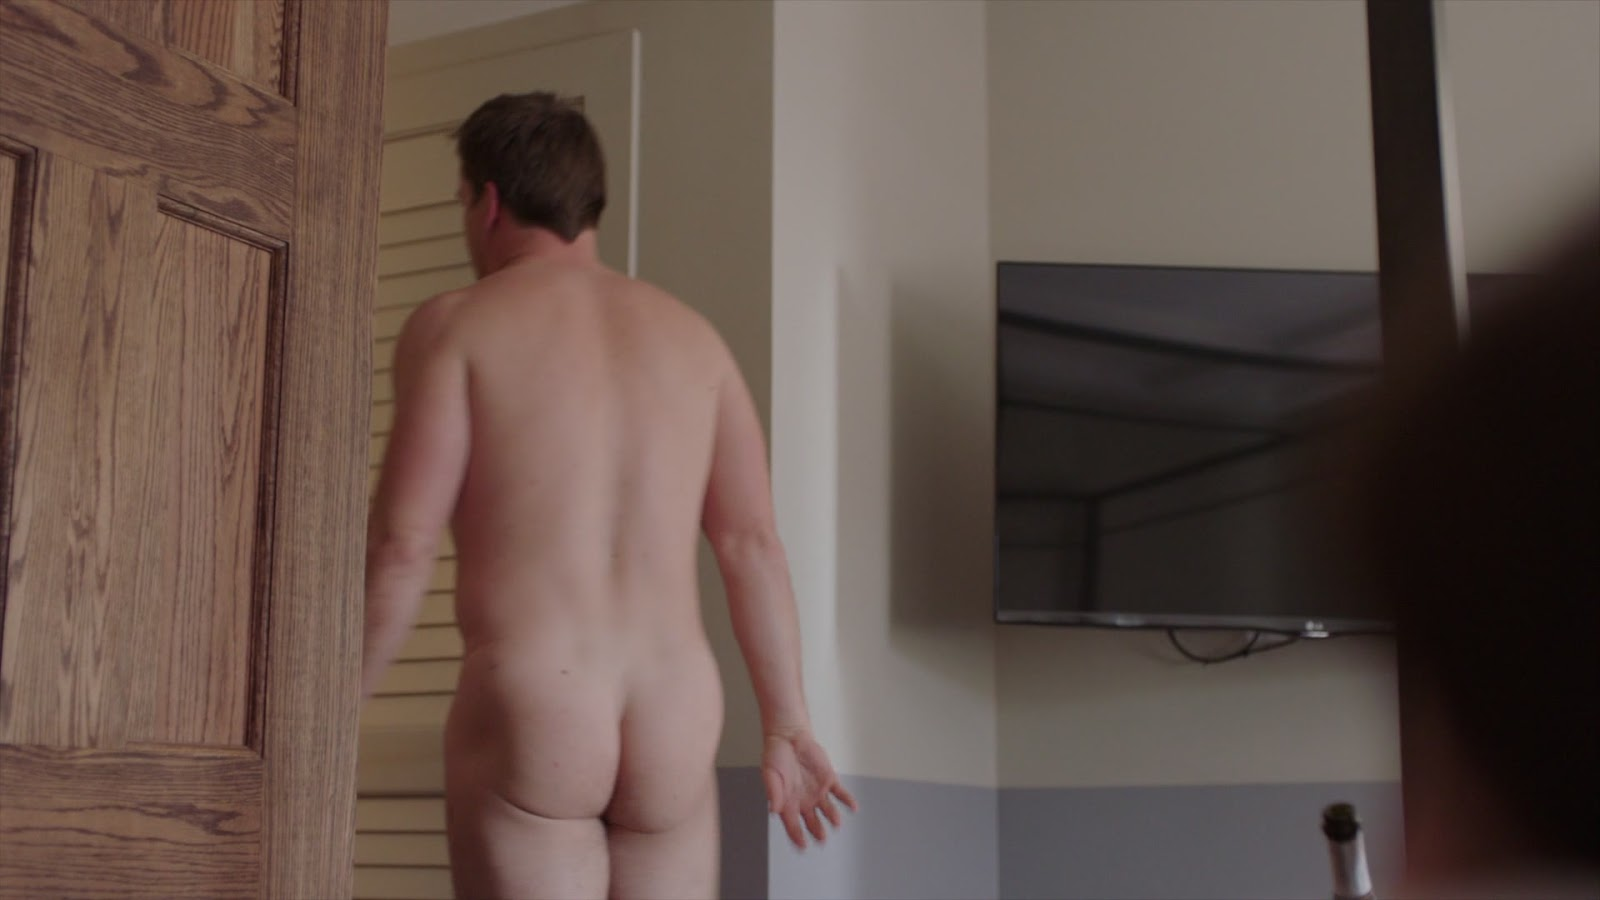 Restituda1S World Of Male Nudity Kyle Bornheimer In -6100